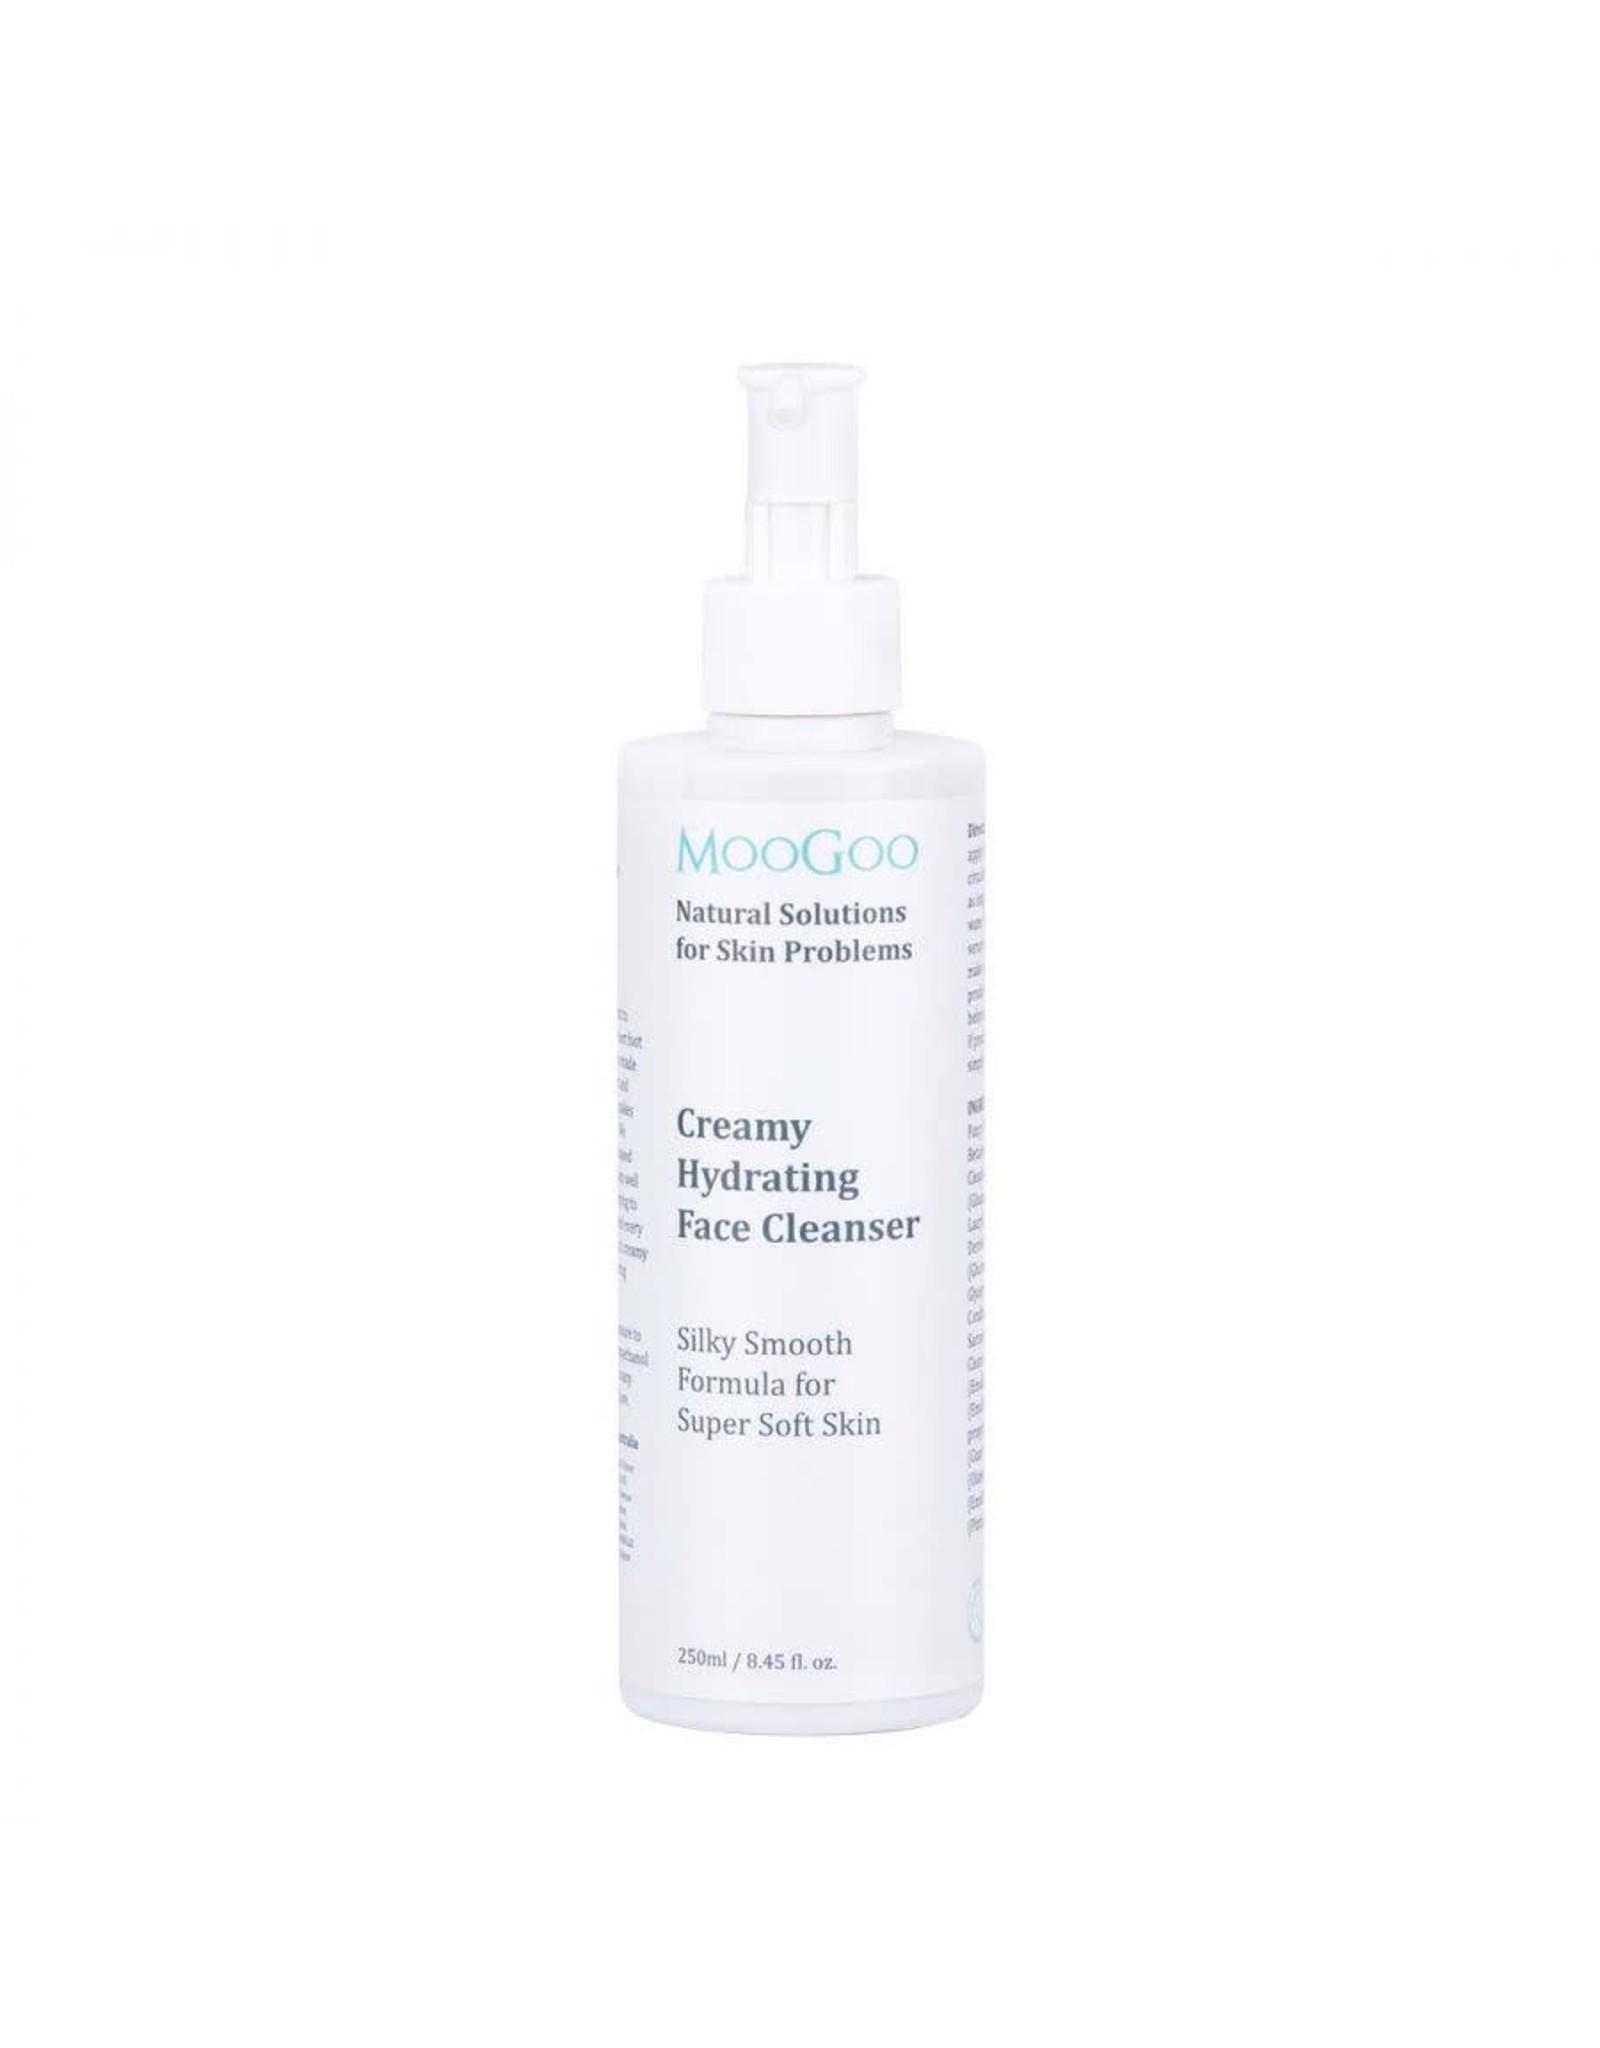 Moogoo Creamy Hydrating Face Cleanser 250ml